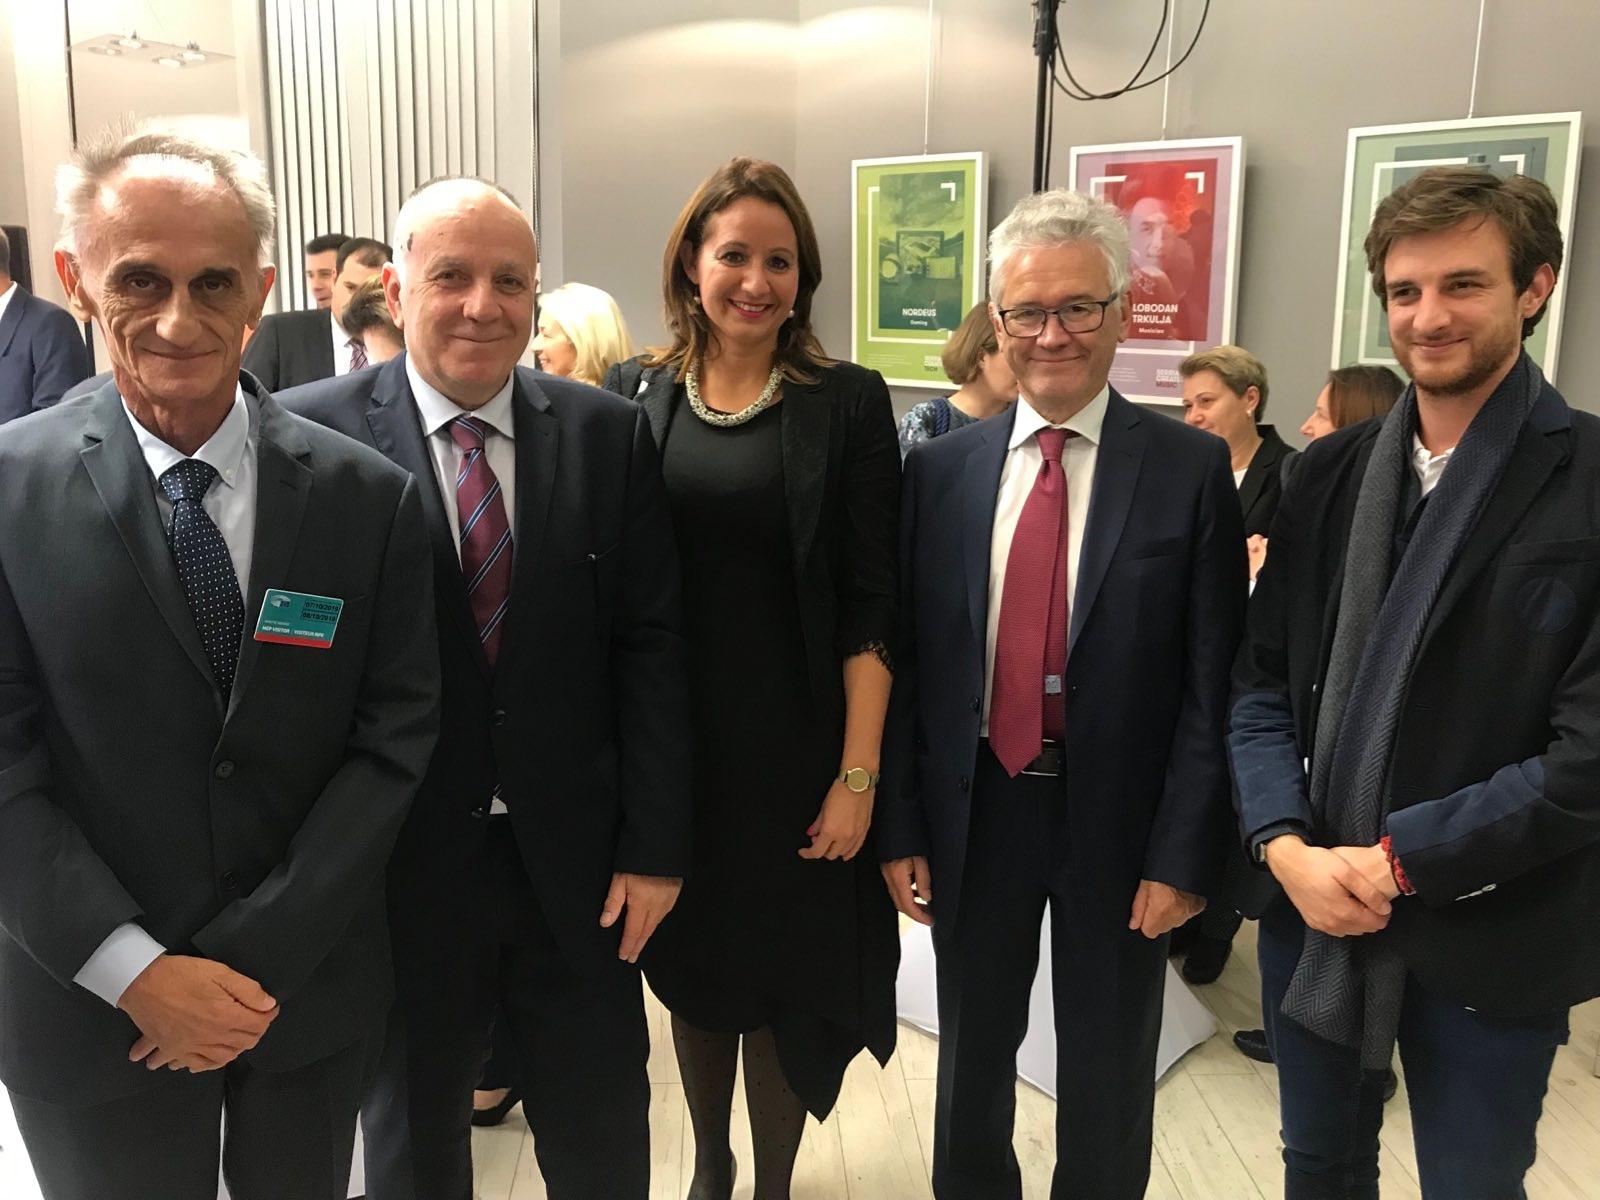 Predsednik Privredne komore Vojvodine Boško Vučurević na Evropskoj nedelji regija i gradova u Briselu